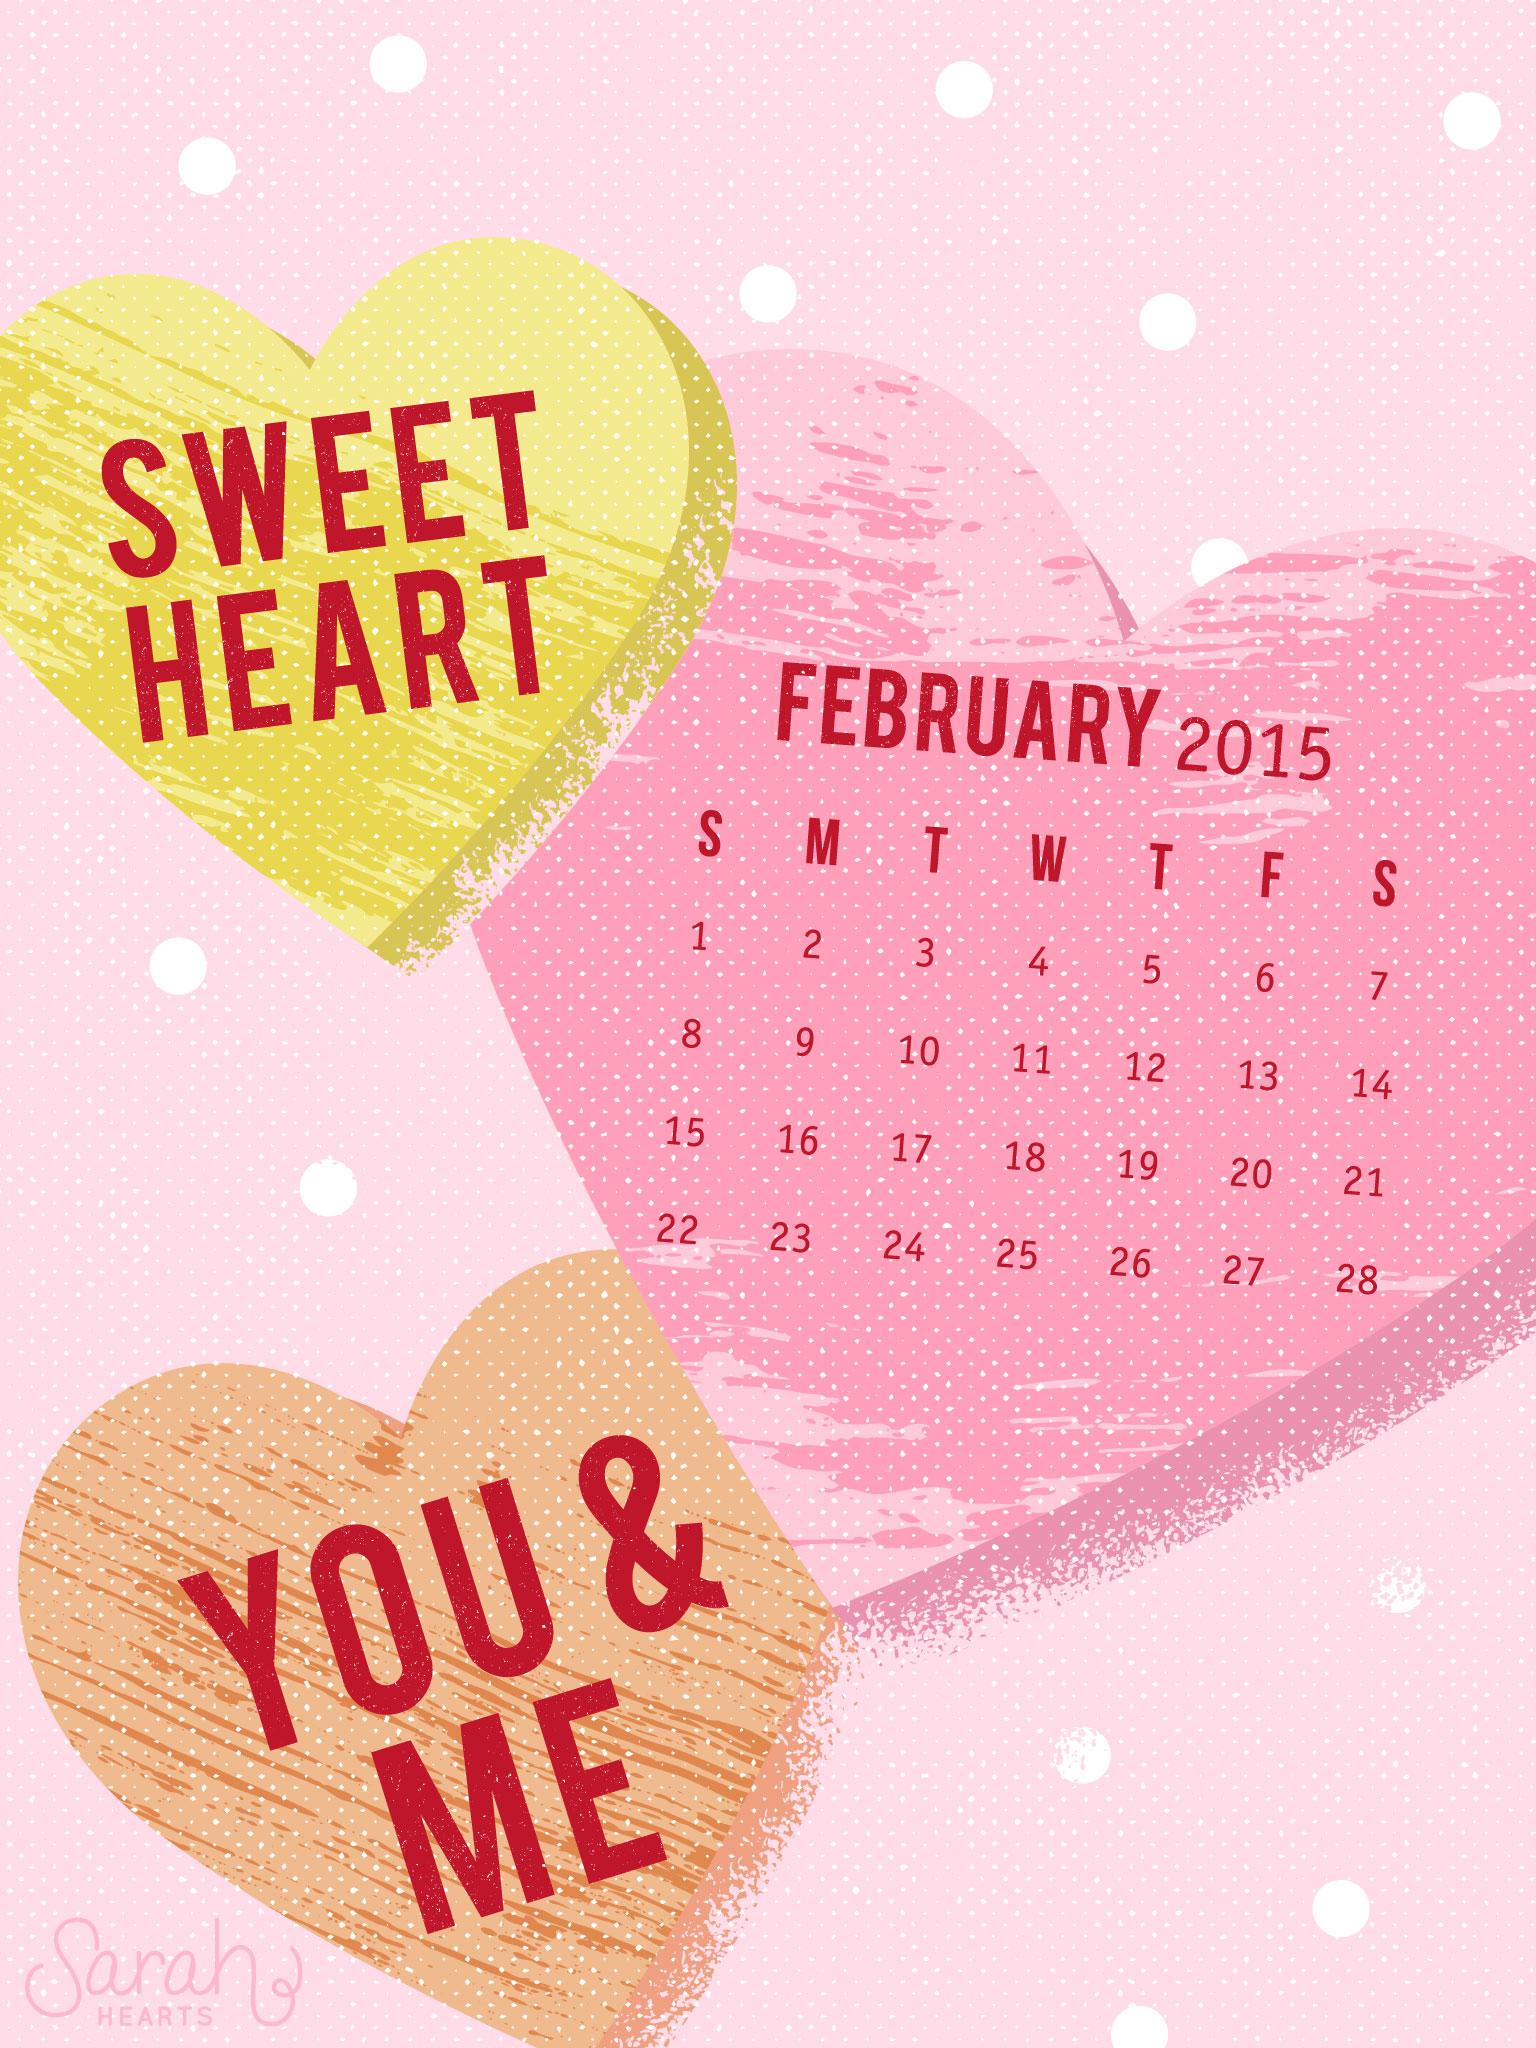 Beautiful Wallpapers For Iphone 6 Plus February 2015 Calendar Wallpaper Sarah Hearts